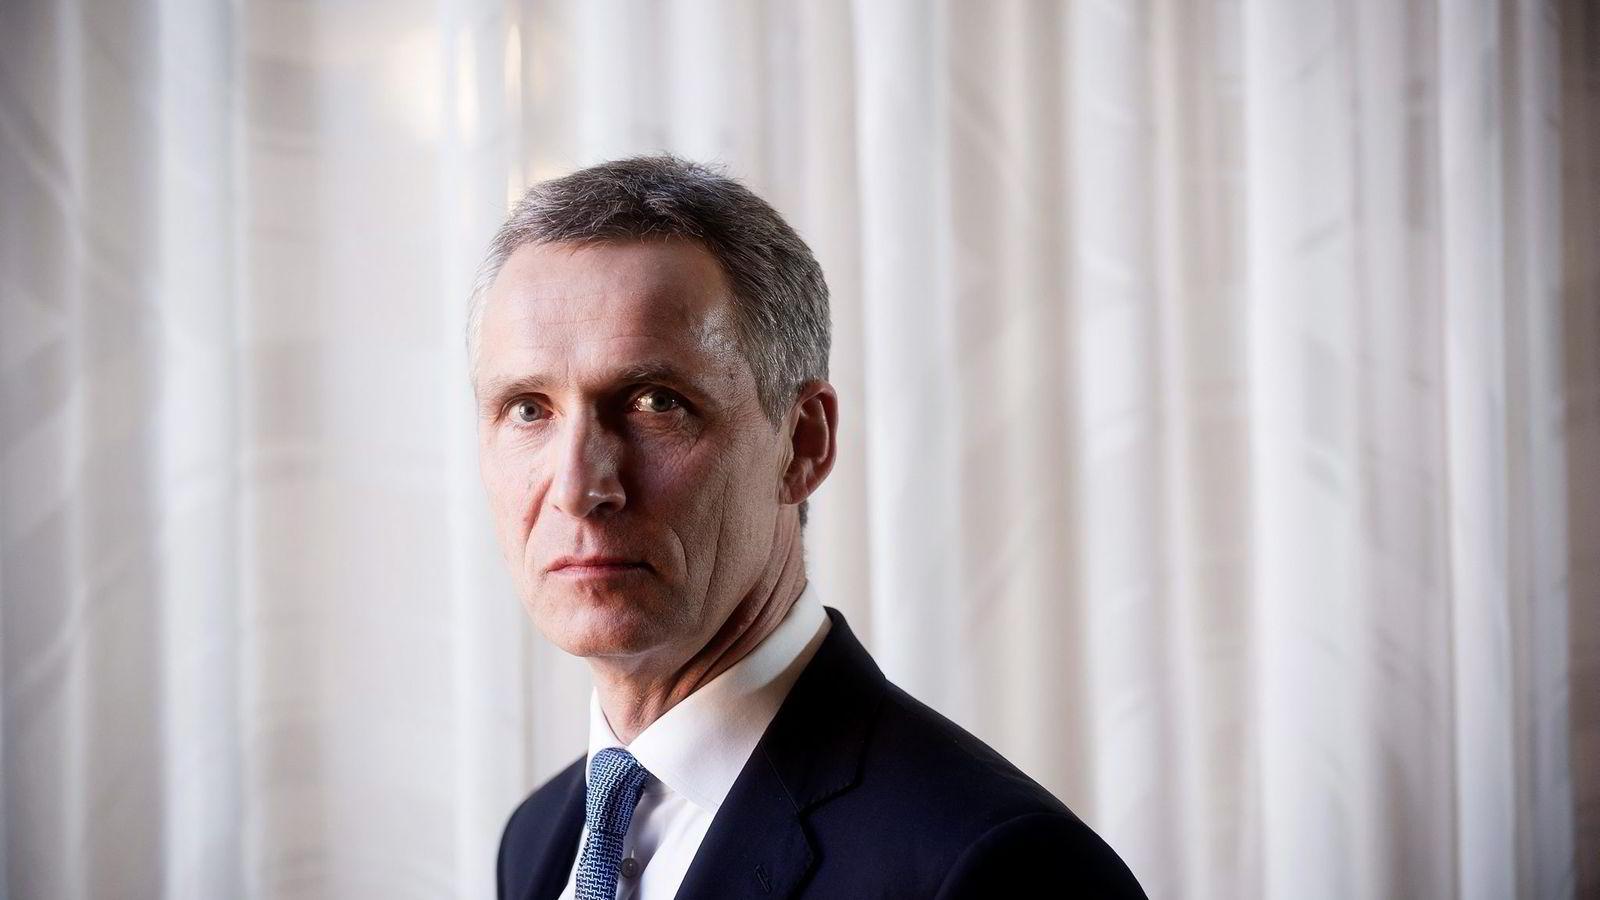 Nato-sjef Jens Stoltenberg. FOTO: Gorm K. Gaare